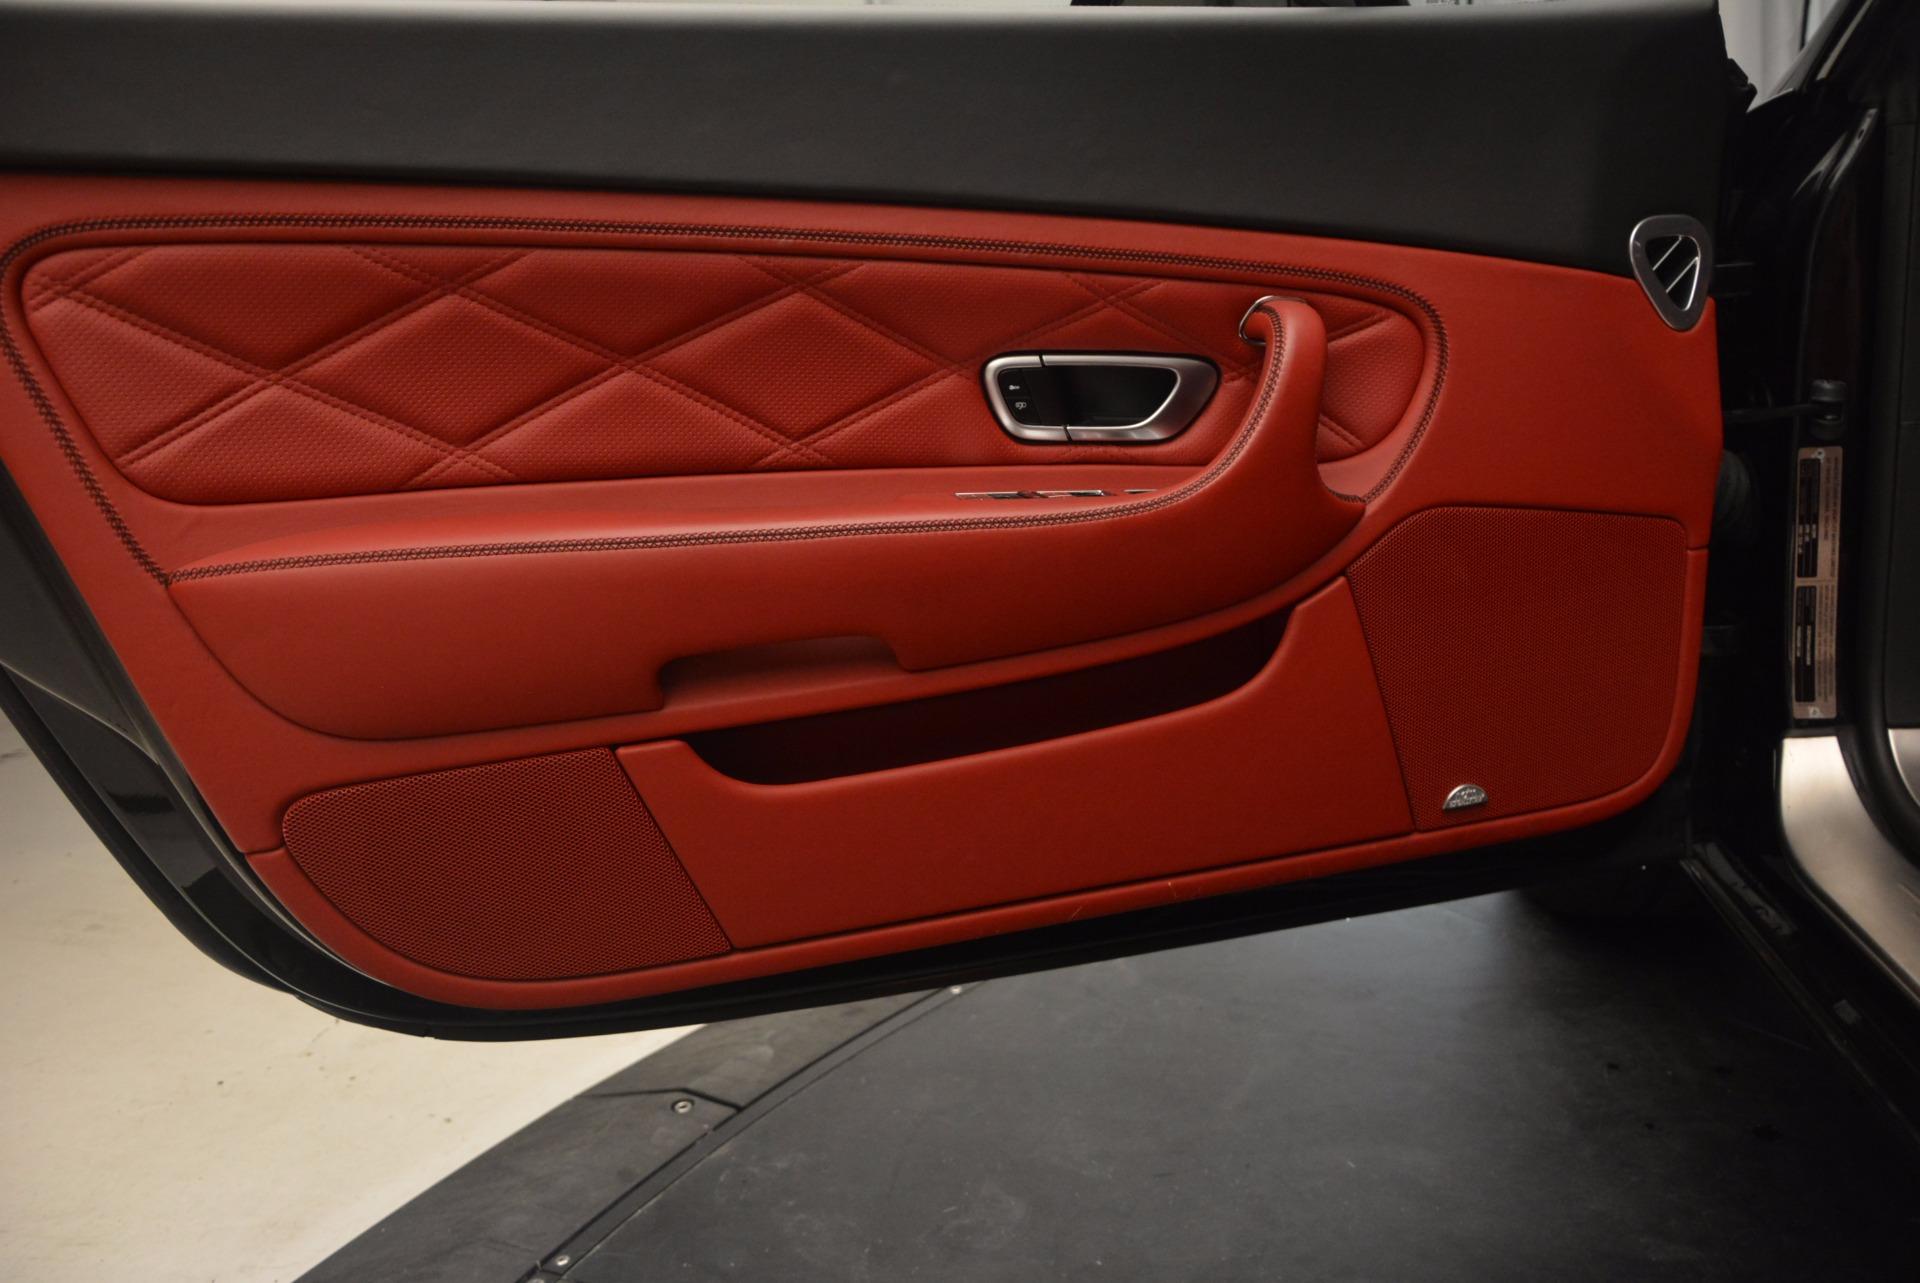 Used 2010 Bentley Continental GT Speed For Sale In Westport, CT 1298_p31